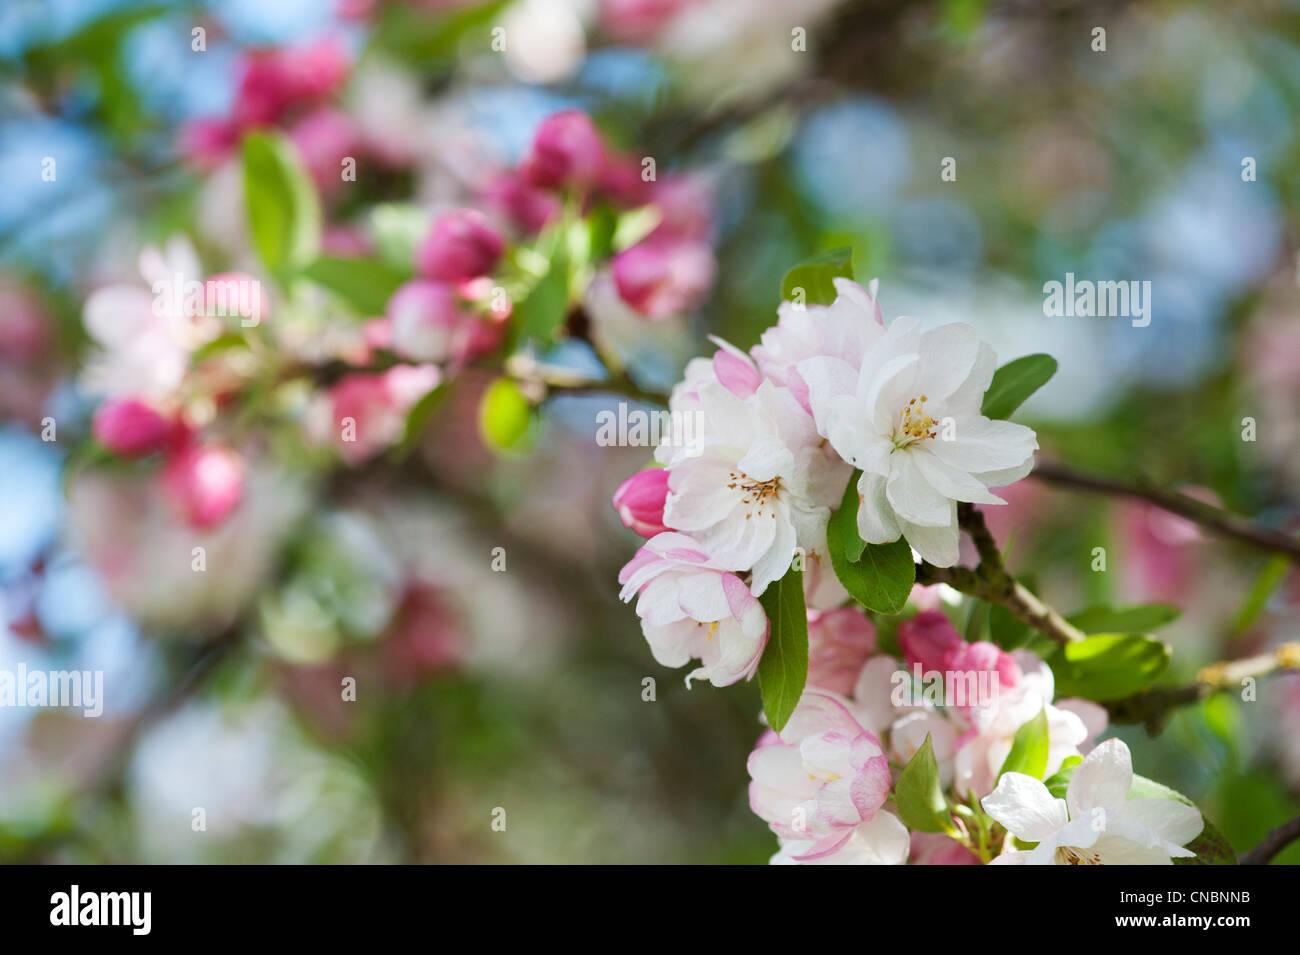 Flowering crabapple trees stock photos flowering crabapple trees crab apple tree blossom stock image mightylinksfo